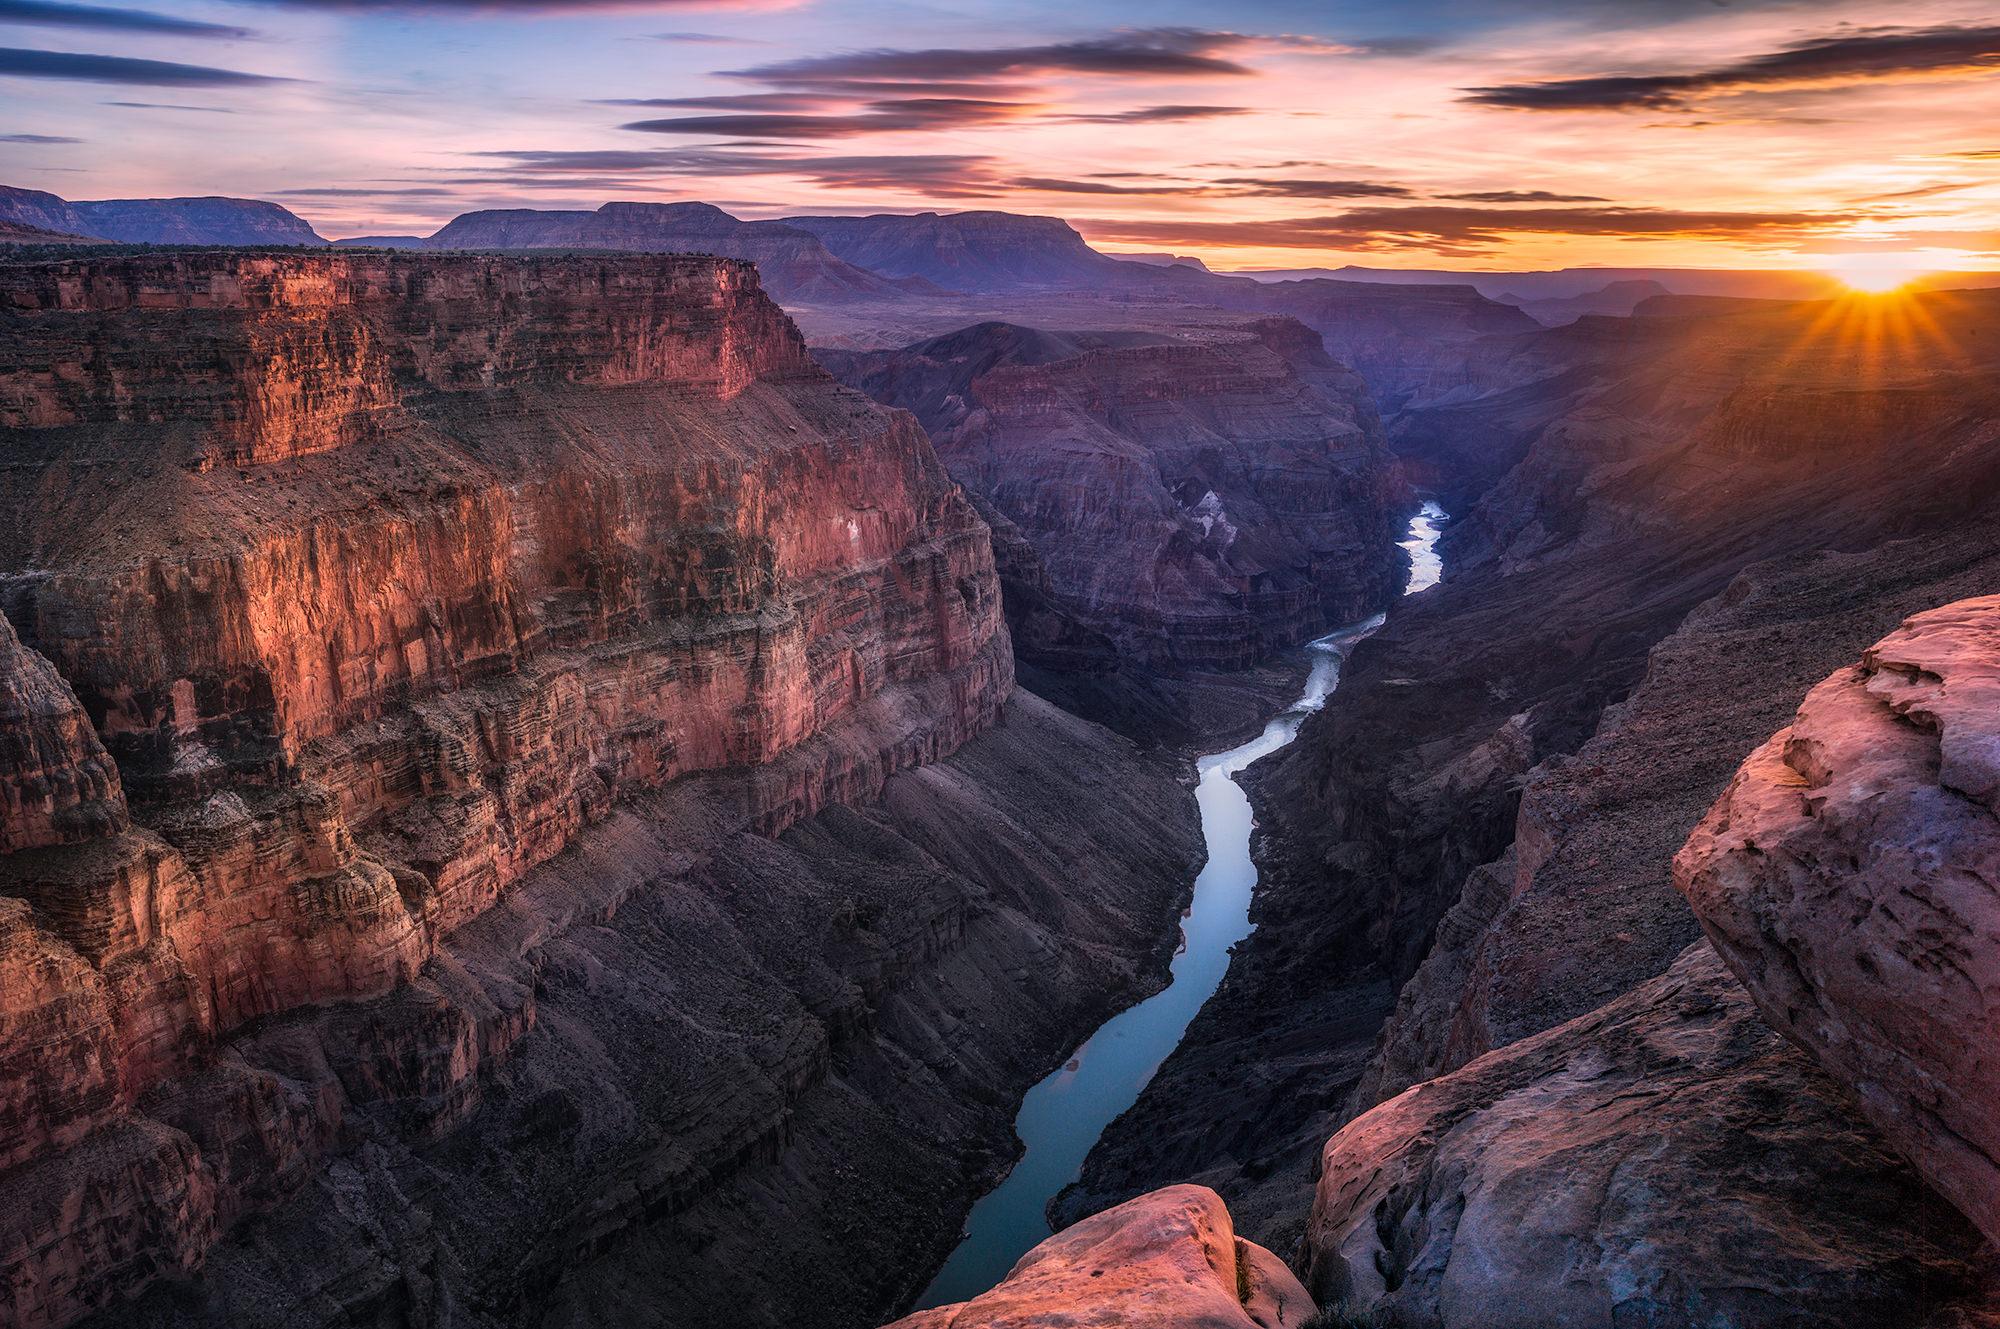 Toroweap - North Rim of Grand Canyon, AZ